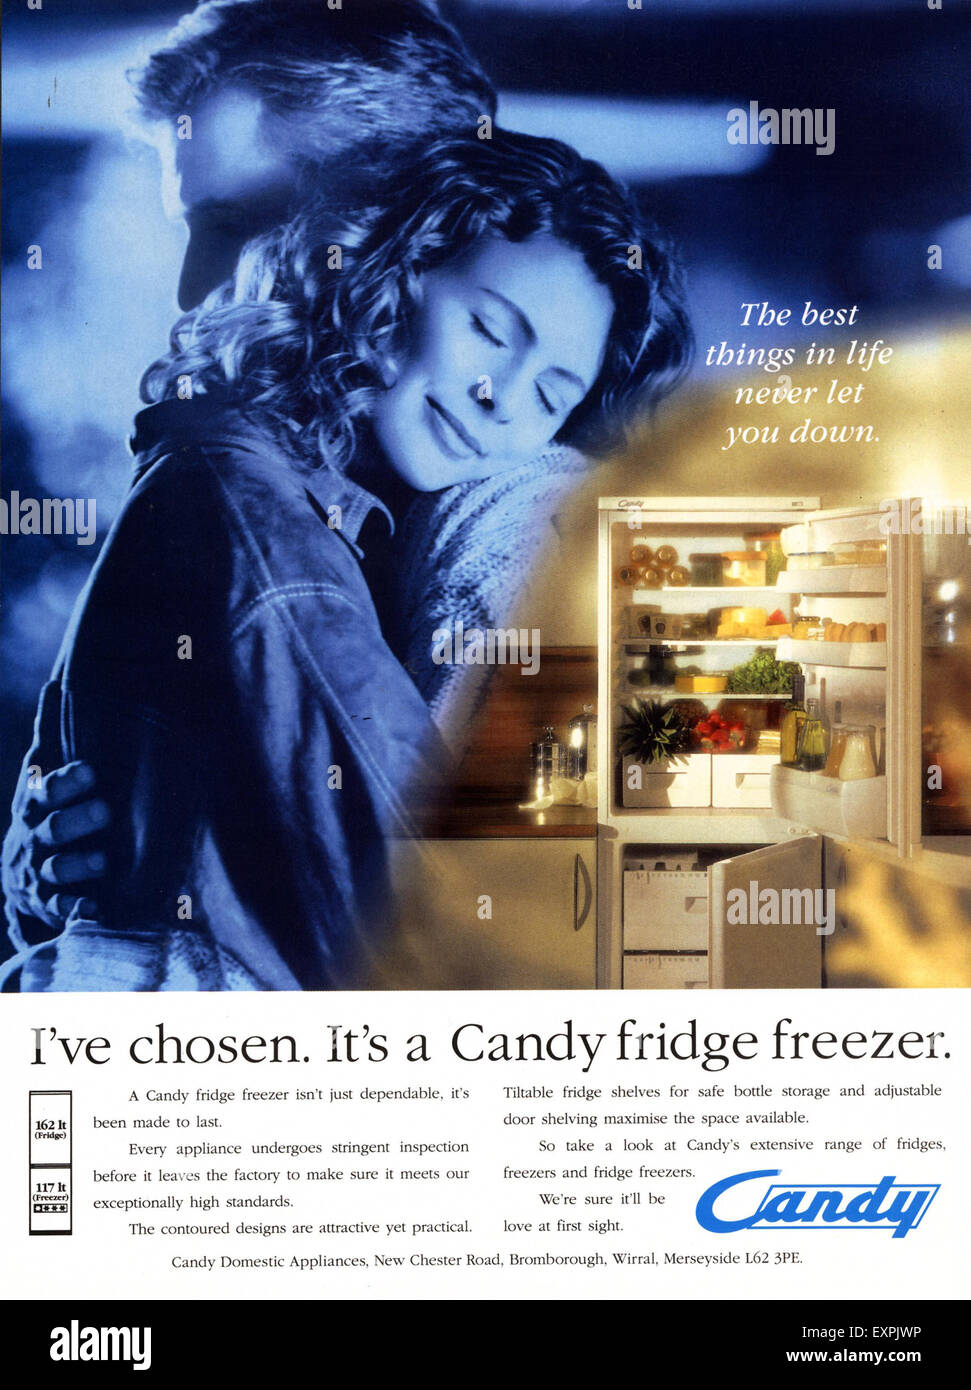 2000s UK Candy Magazine Advert Stock Photo: 85320306 - Alamy